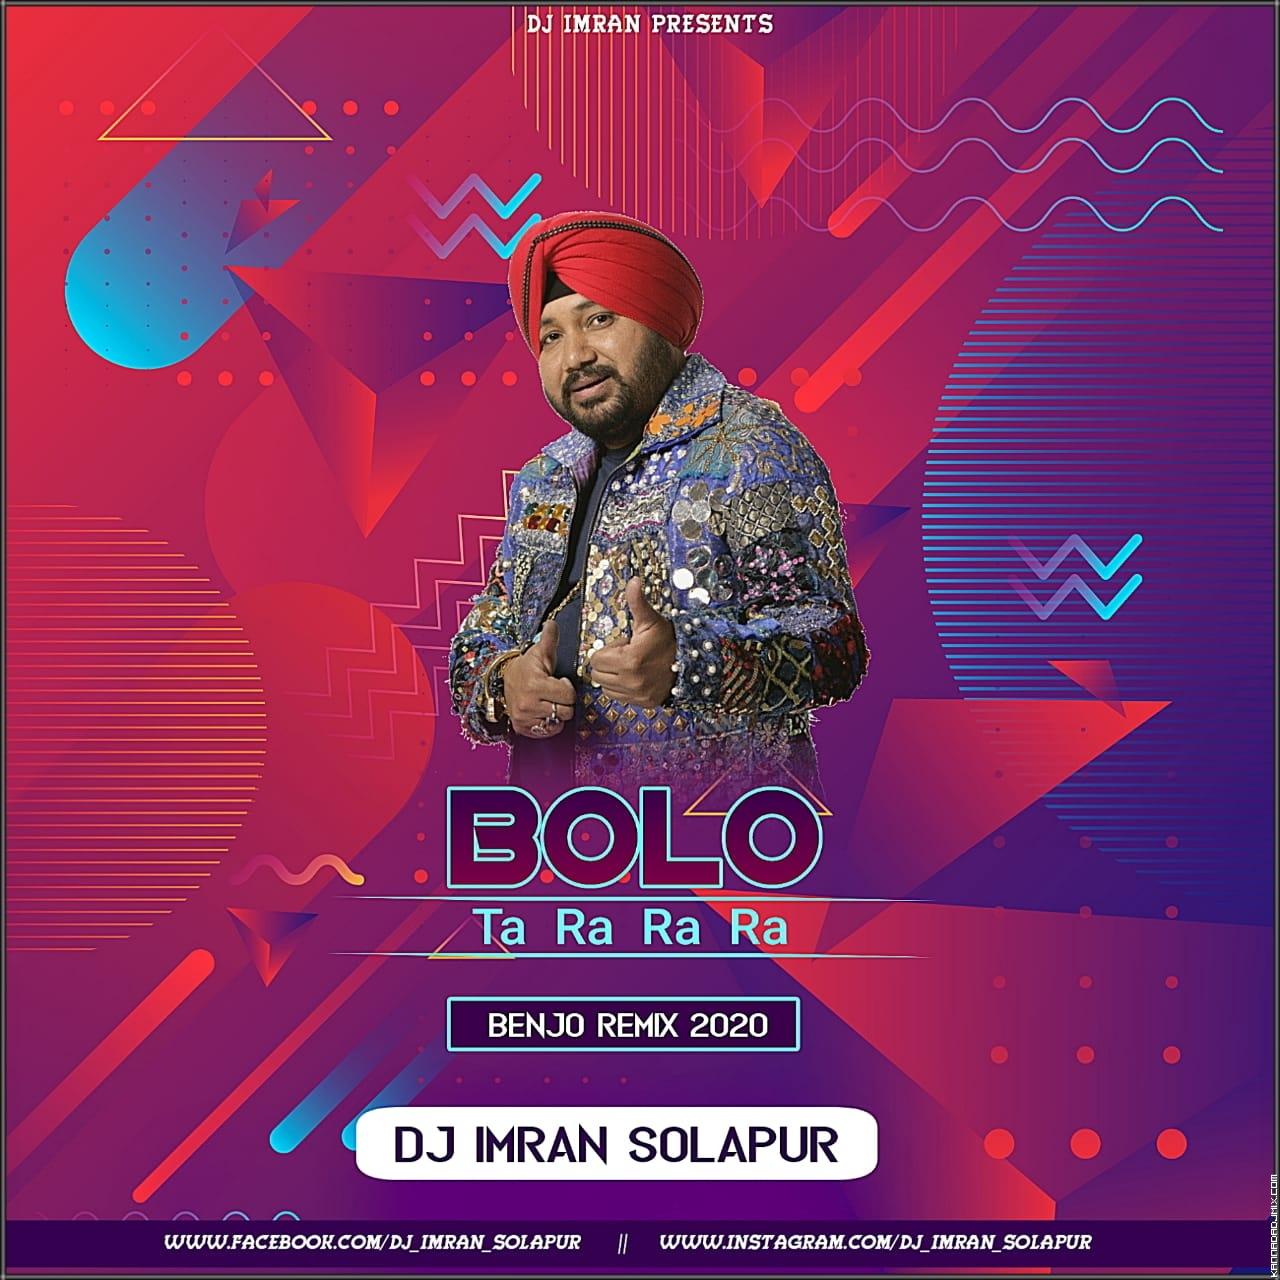 Bolo Ta Ra Ra (Benjo Mix 2020) Dj Imran Solapur.mp3